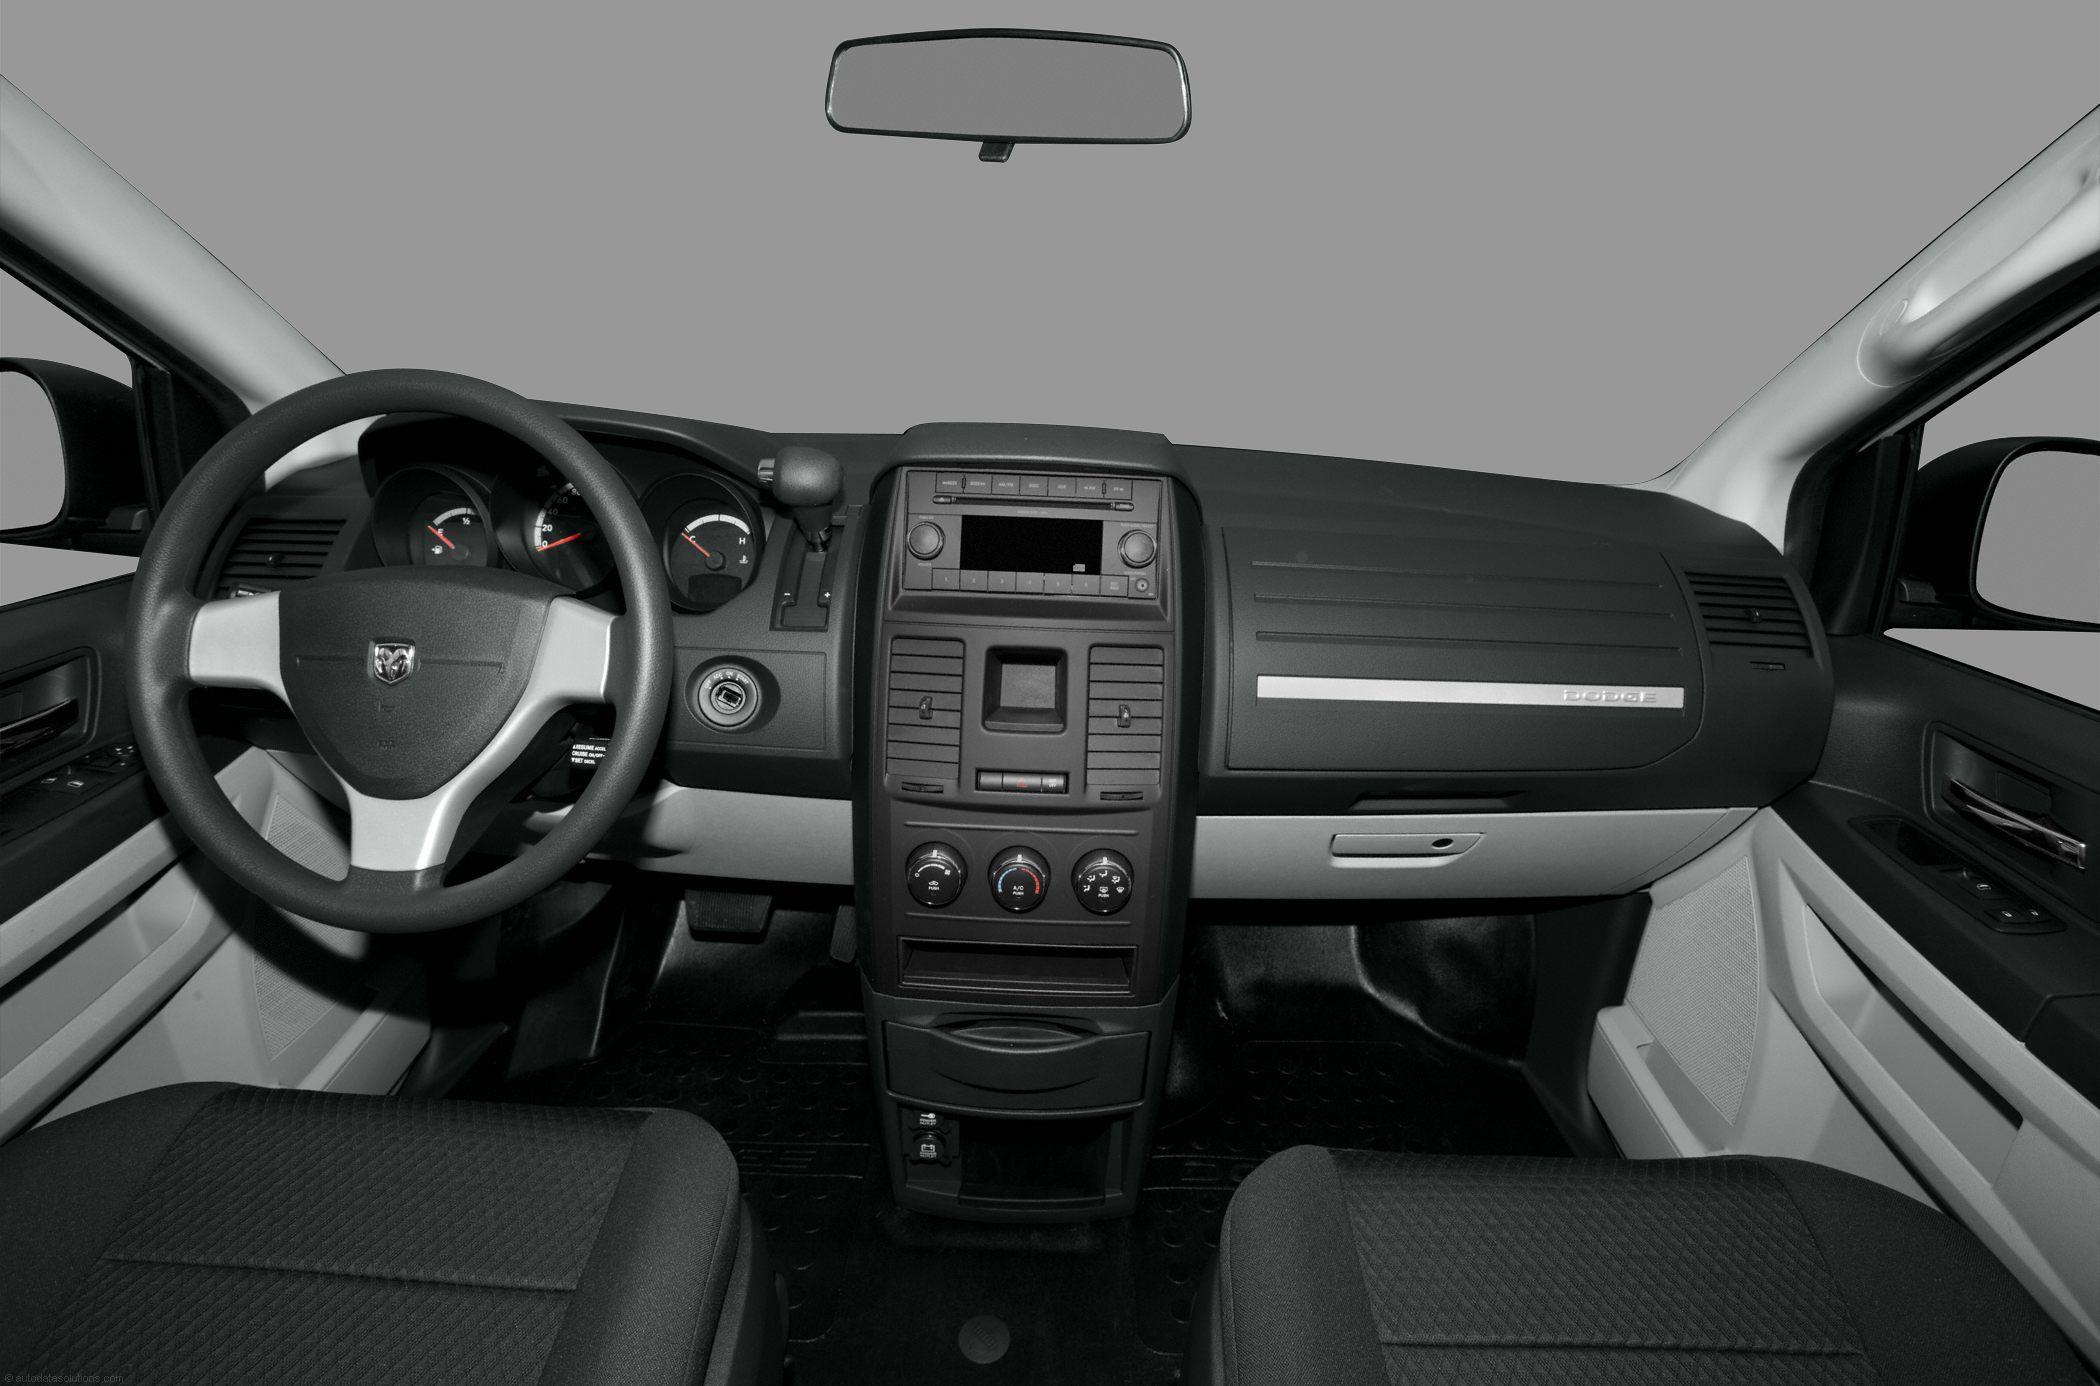 2010 dodge grand caravan minivan van c v cargo van interior front seats 2100 1386. Black Bedroom Furniture Sets. Home Design Ideas